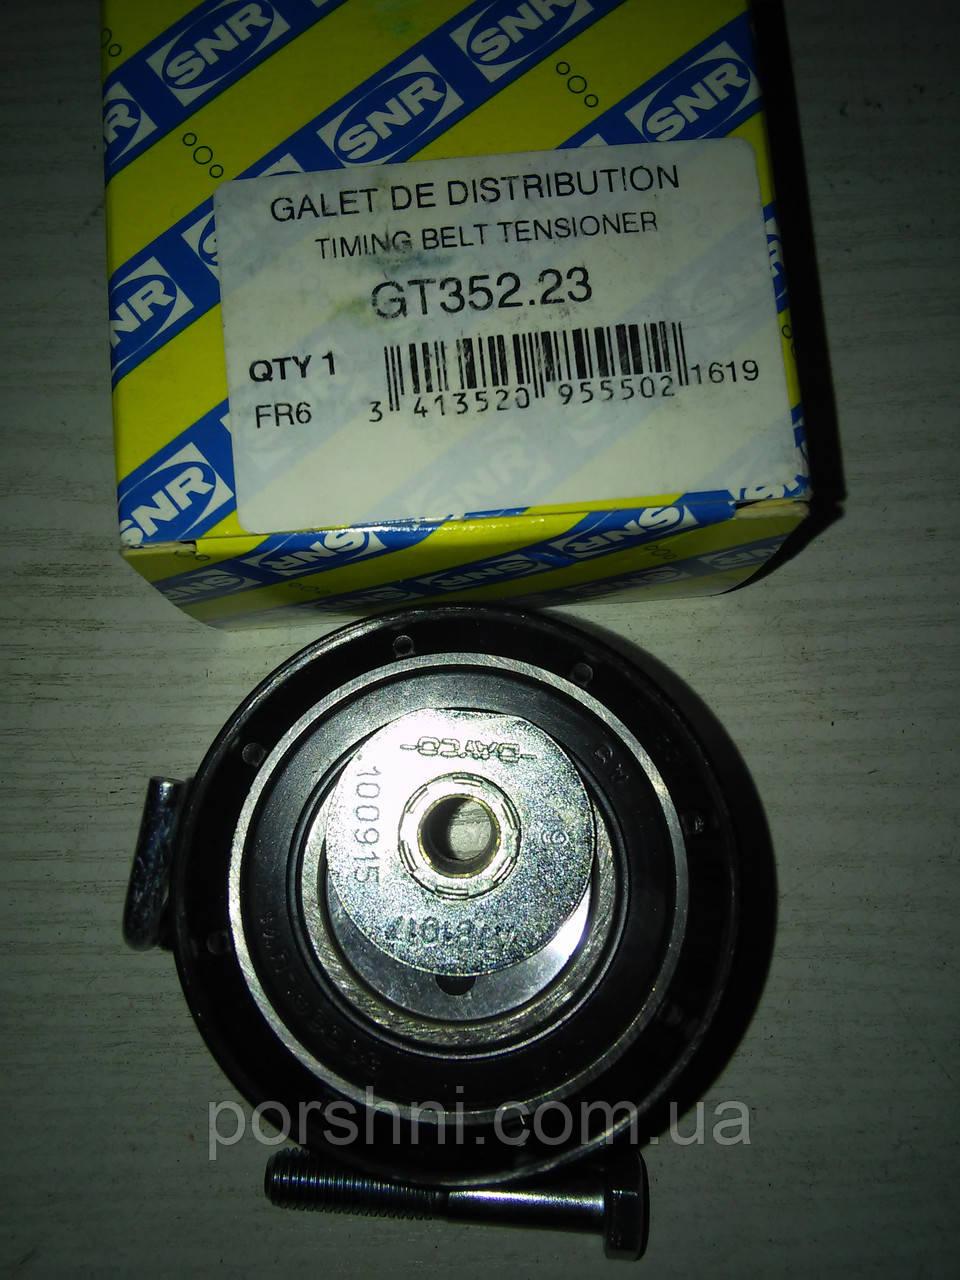 Ролик ремня  ГРМ Ford  Fiesta  1.25 - 1.6 2004 -- Focus 1.4 - 1.6  2004 --  SNR   GT352.23